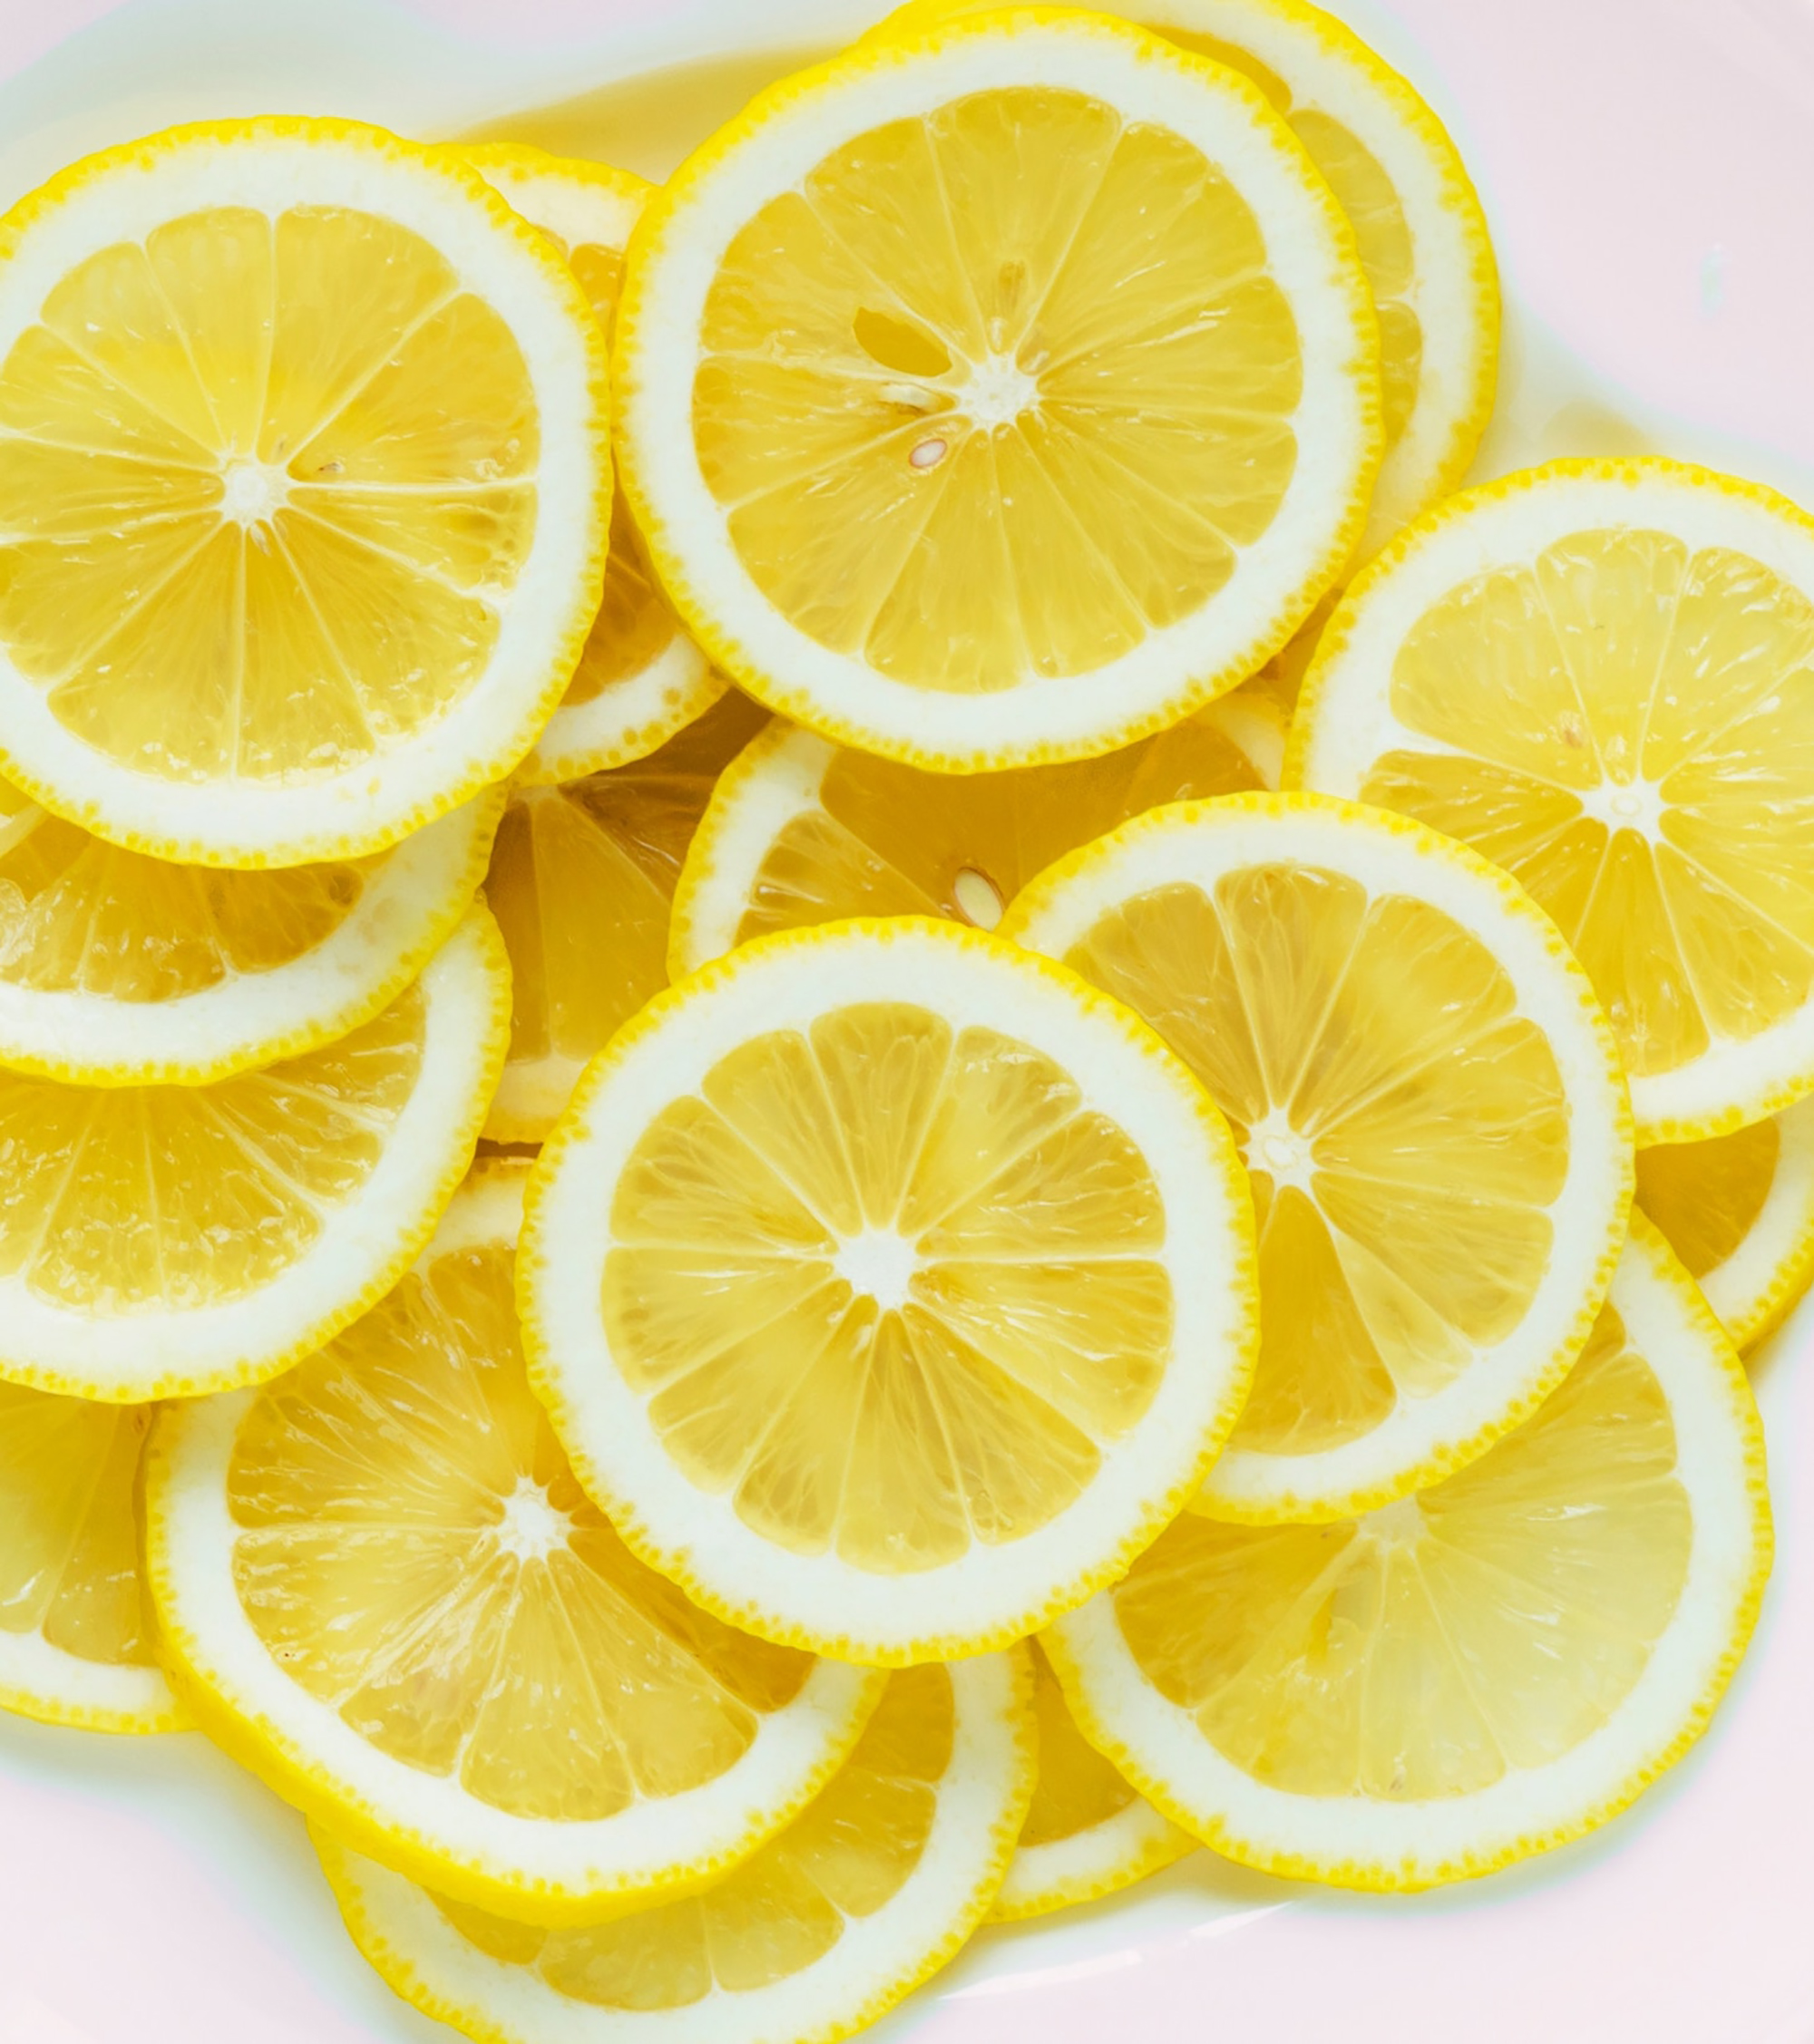 lemon pic.jpg